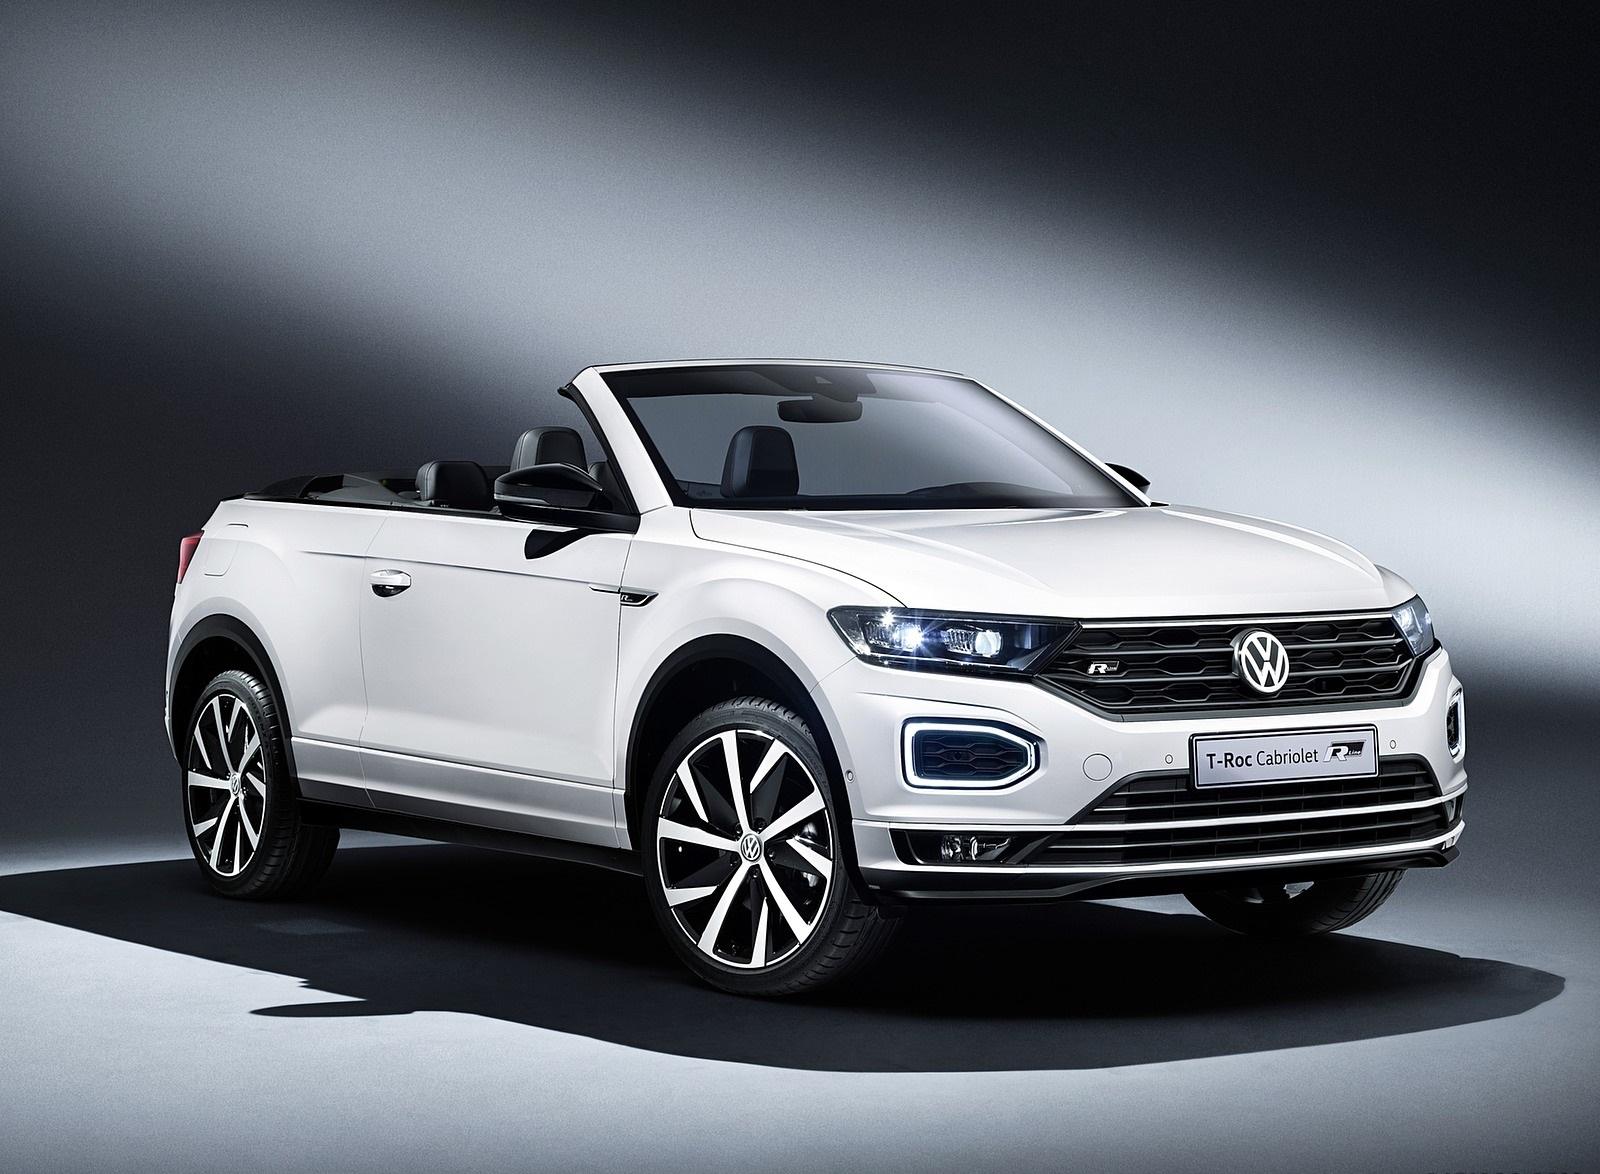 2020 Volkswagen T-Roc Cabriolet Front Three-Quarter Wallpapers (8)